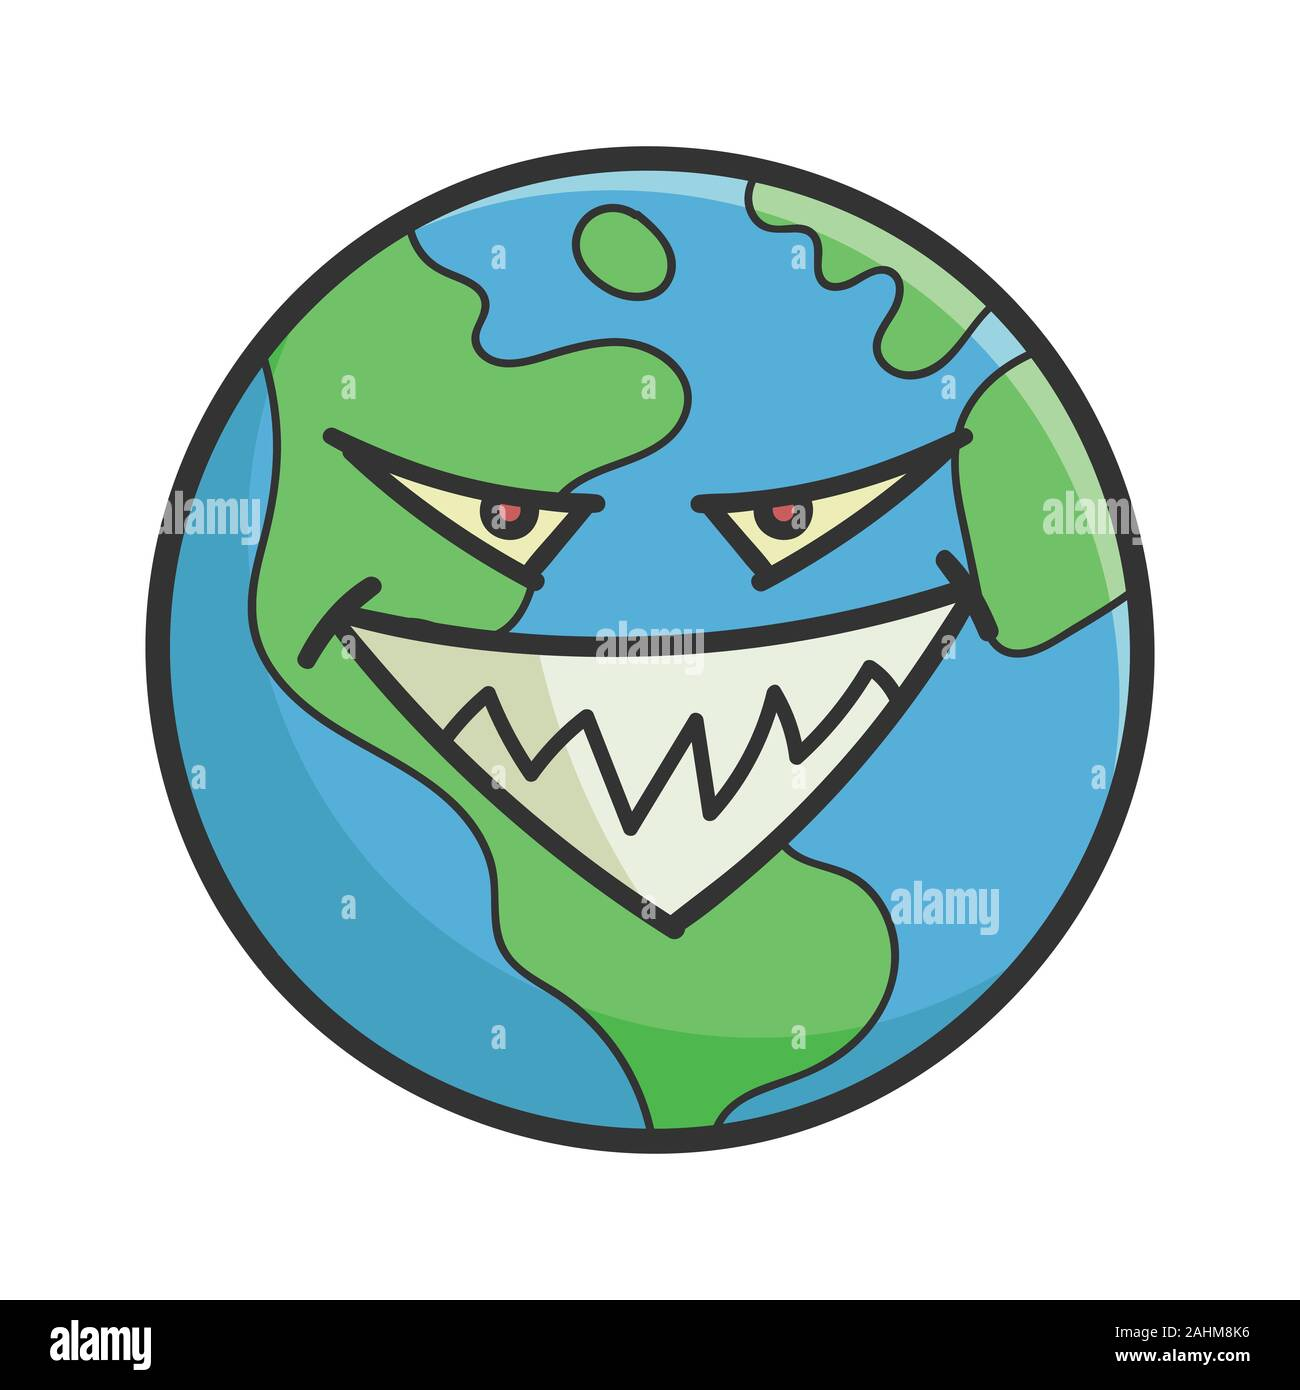 Image result for pic evil teeth smile | Smile drawing, Evil smile, Monster  mouth